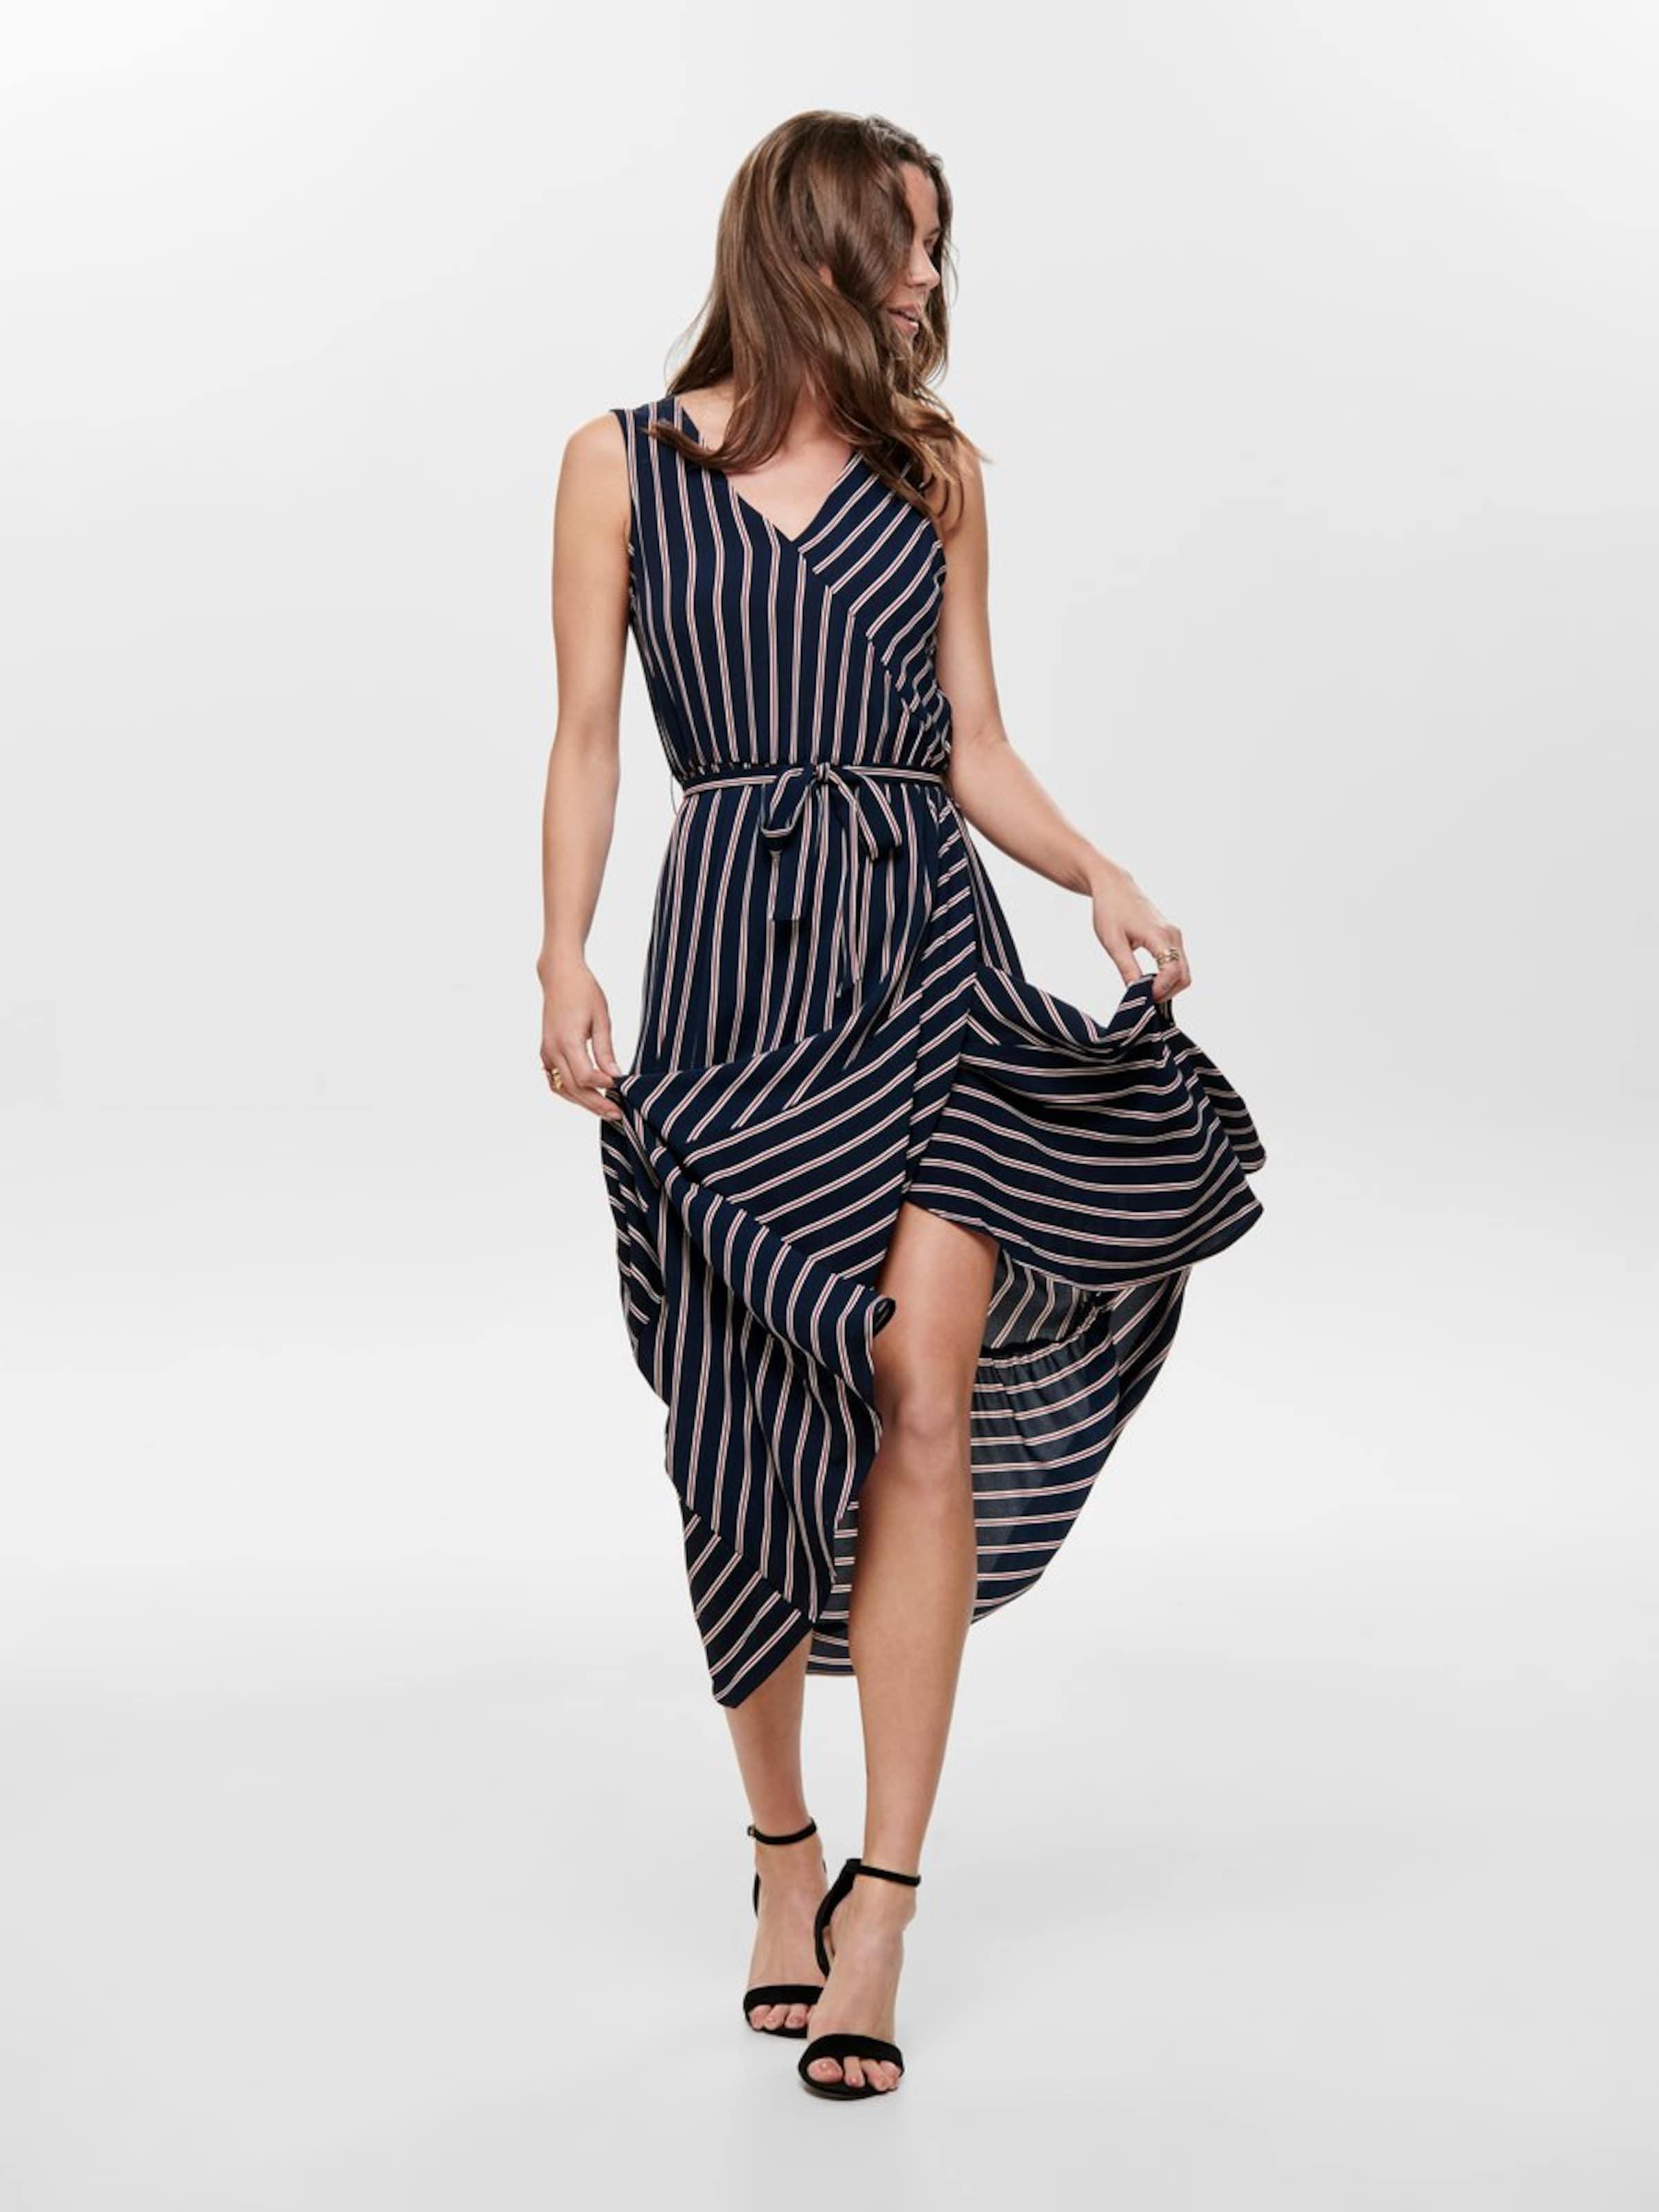 Kleid NavyWeiß In Jacqueline Yong De GMpzqSUV